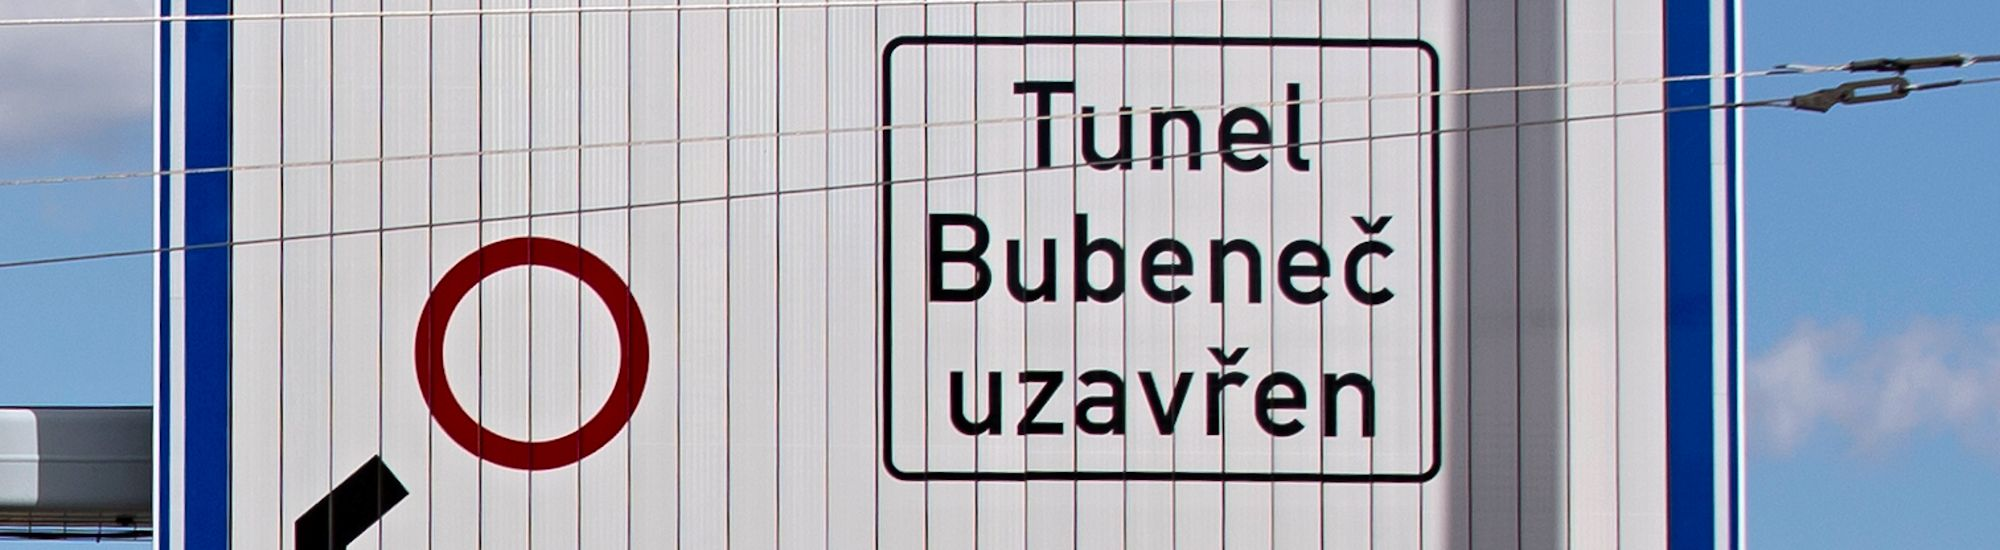 Uzávěra Bubenečského tunelu 16.-17.1.2016